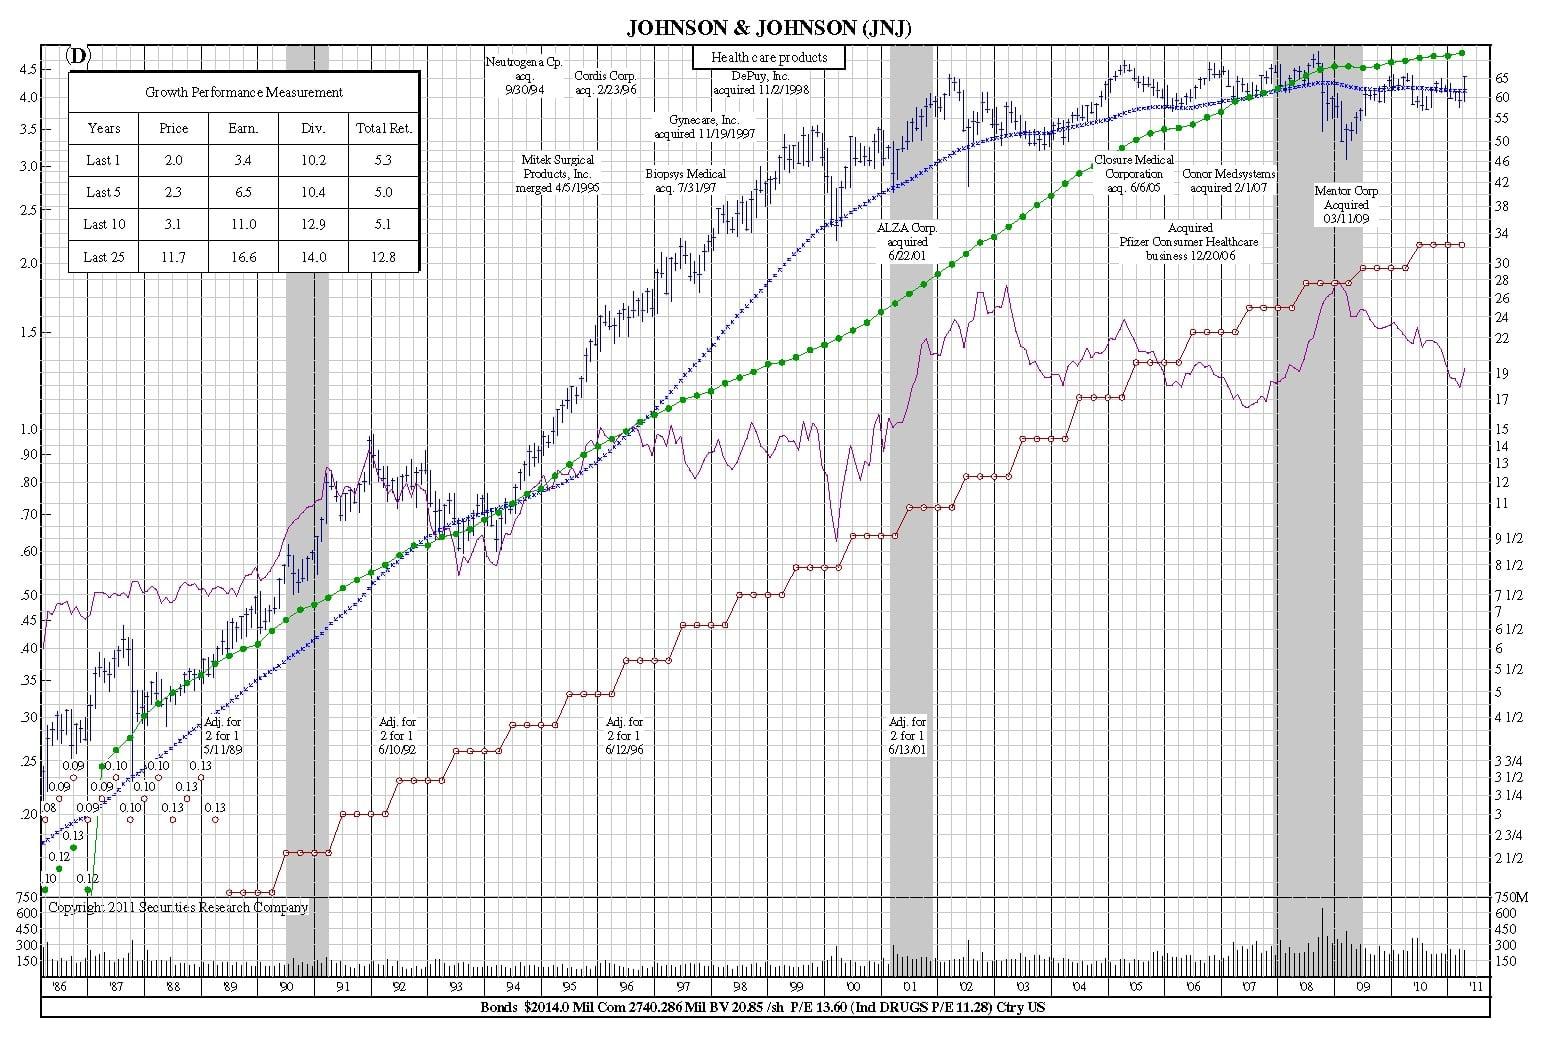 jnj-25-year-chart